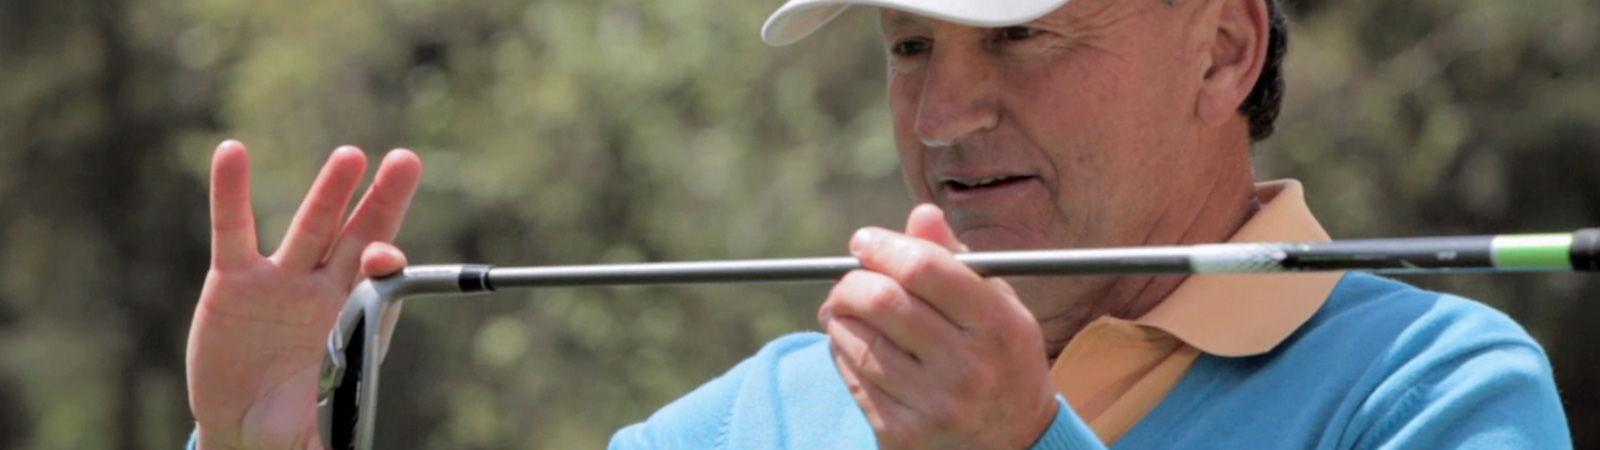 Extroardinary-Golf